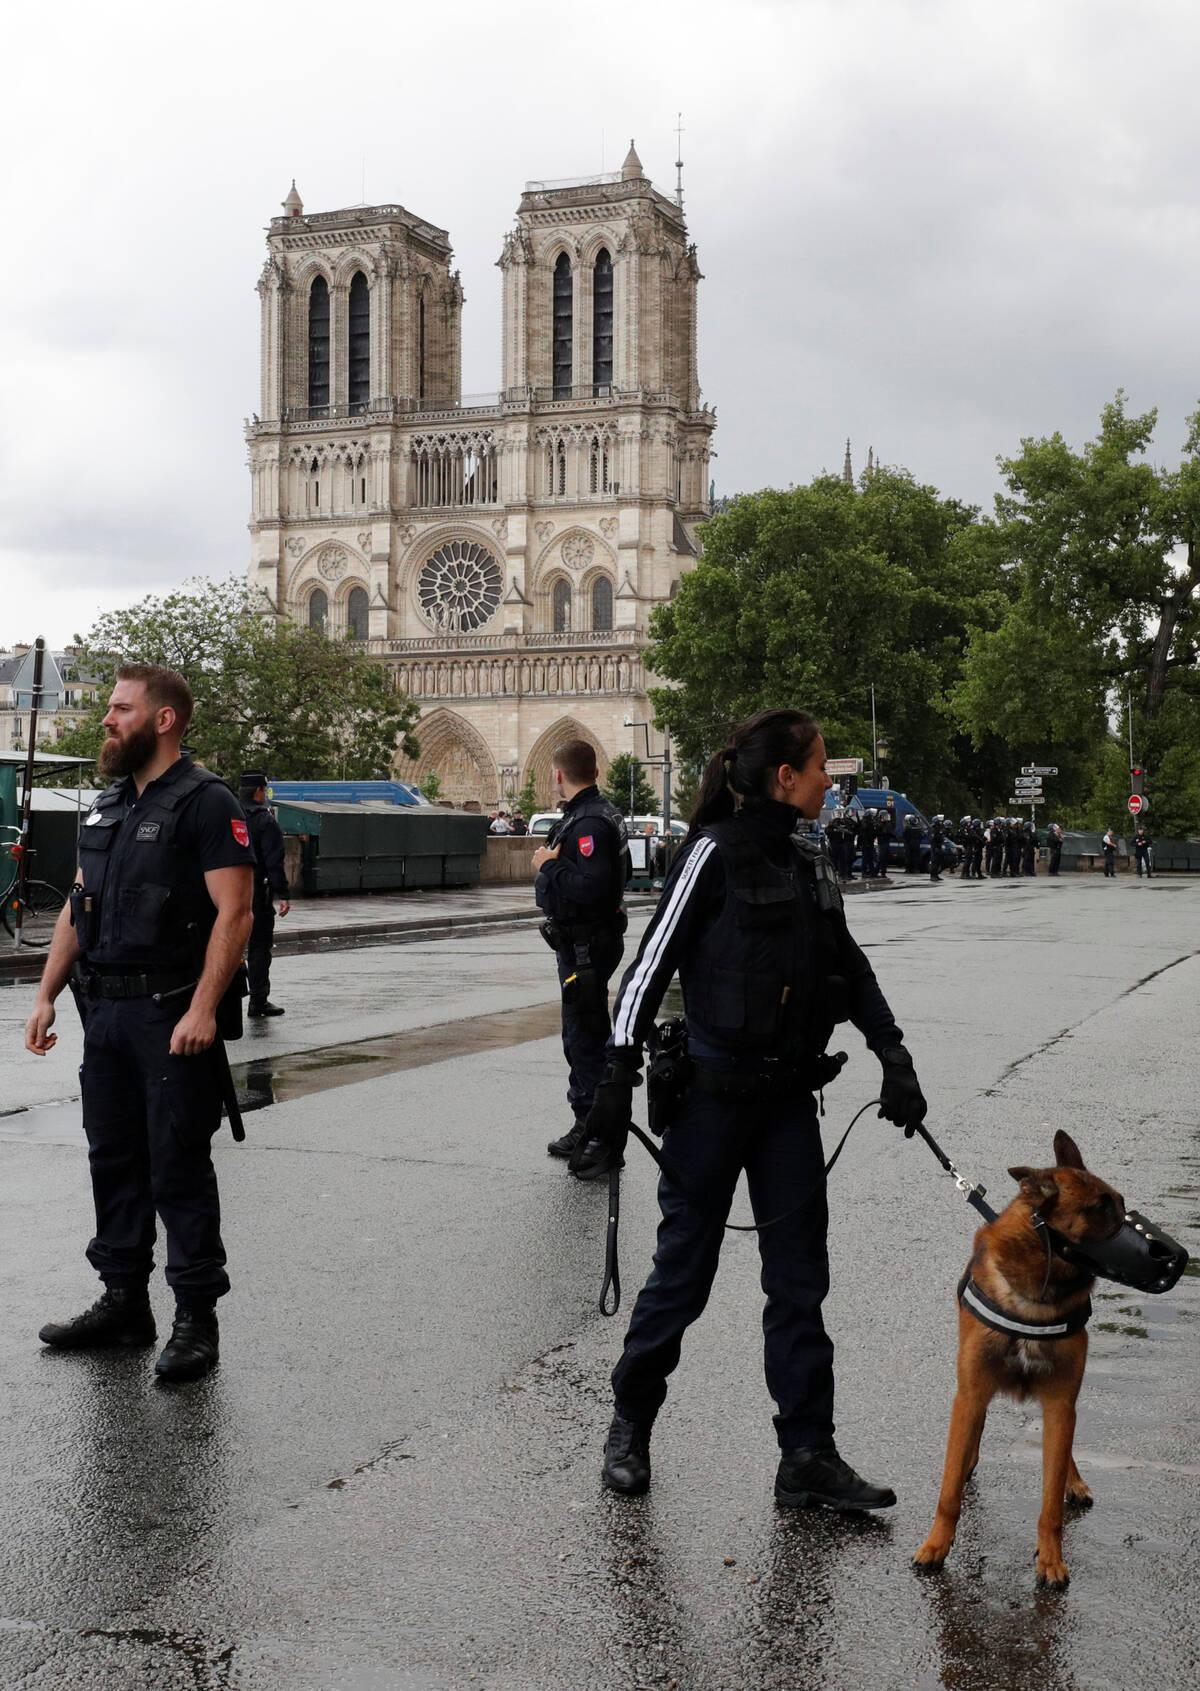 2017 06 06T152148Z 1726771303 RC1F1CFAE6F0 RTRMADP 3 EUROPE ATTACKS FRANCE POLICE